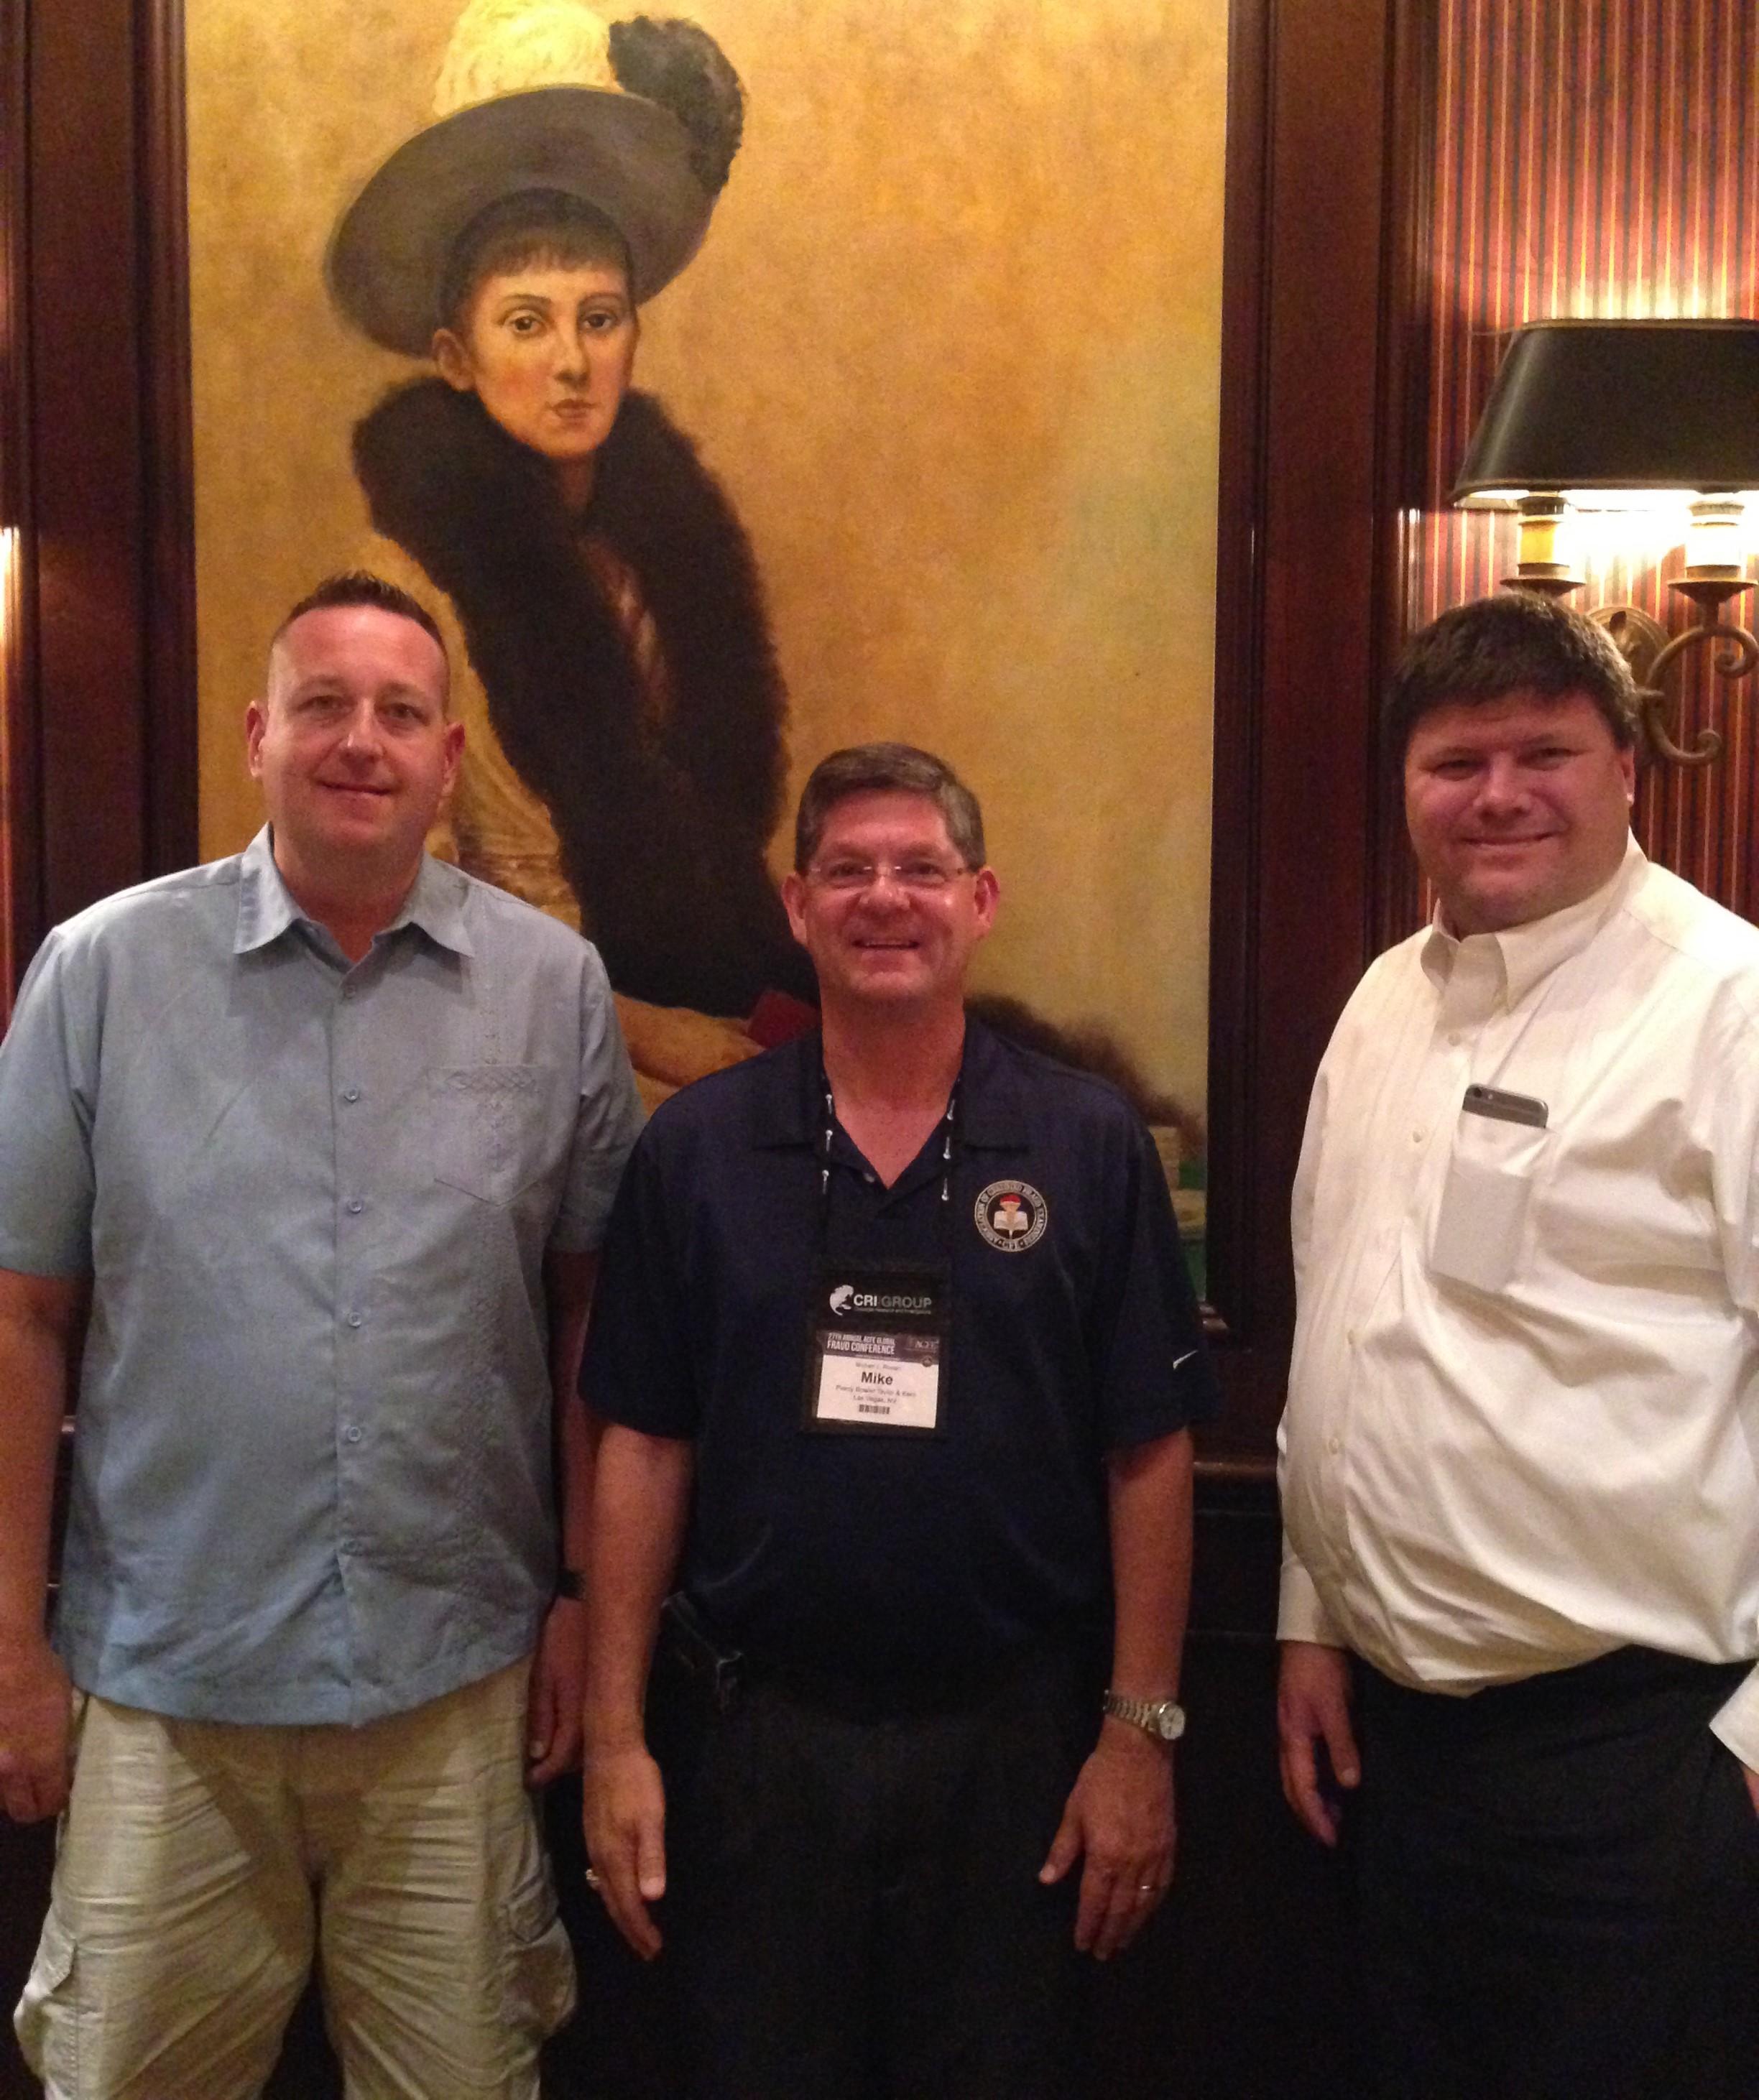 Tournament winner Chris Dransfeldt with Las Vegas Chapter Leaders Mike Rosten and James Vaughn